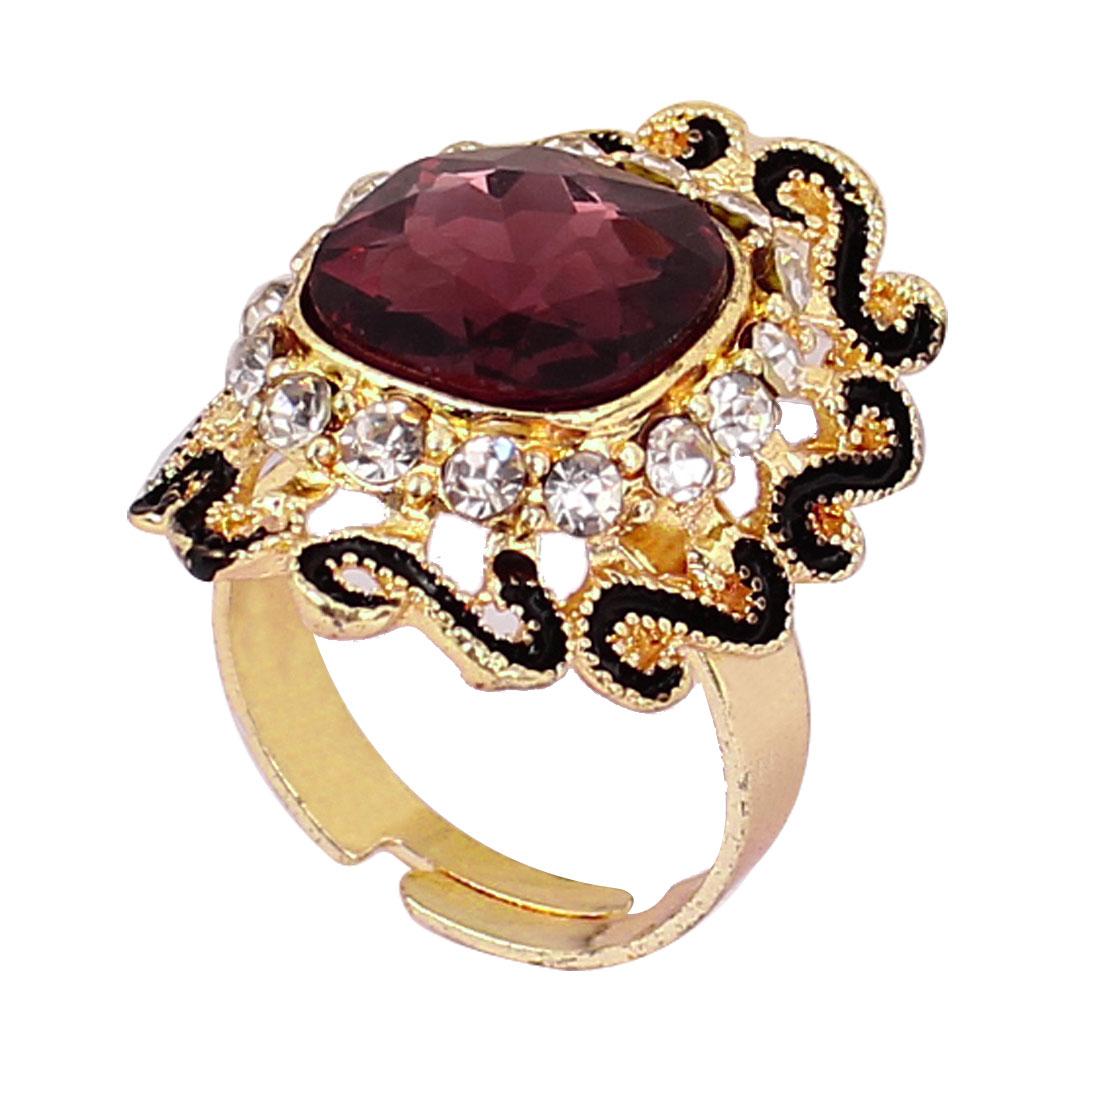 US 8 Gold Tone Dark Purple Square Shape Rhinestone Inlaid Finger Ring for Lady